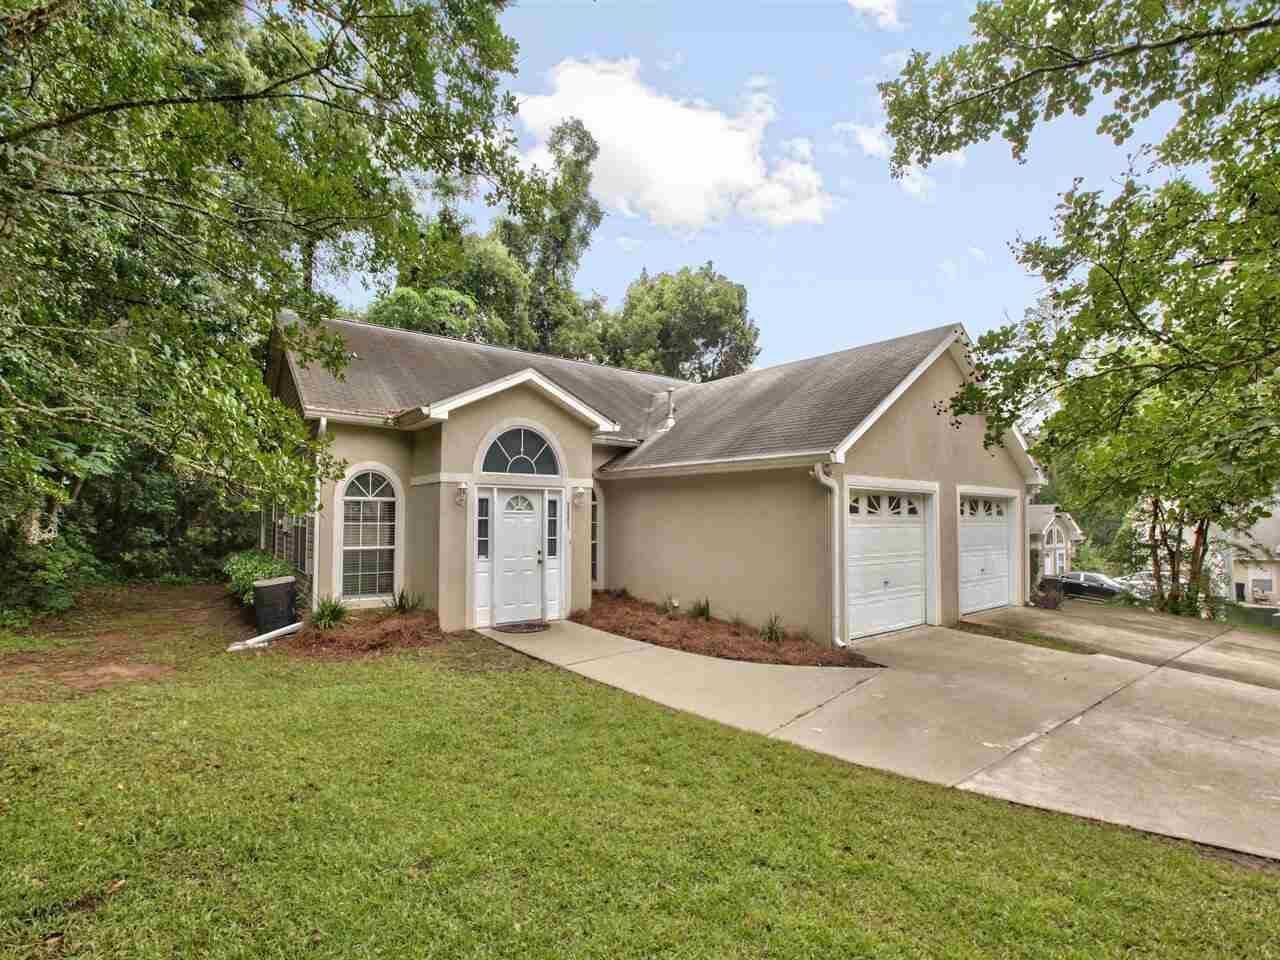 3481 Chatelaine Ct, Tallahassee, FL 32308 - MLS#: 332282